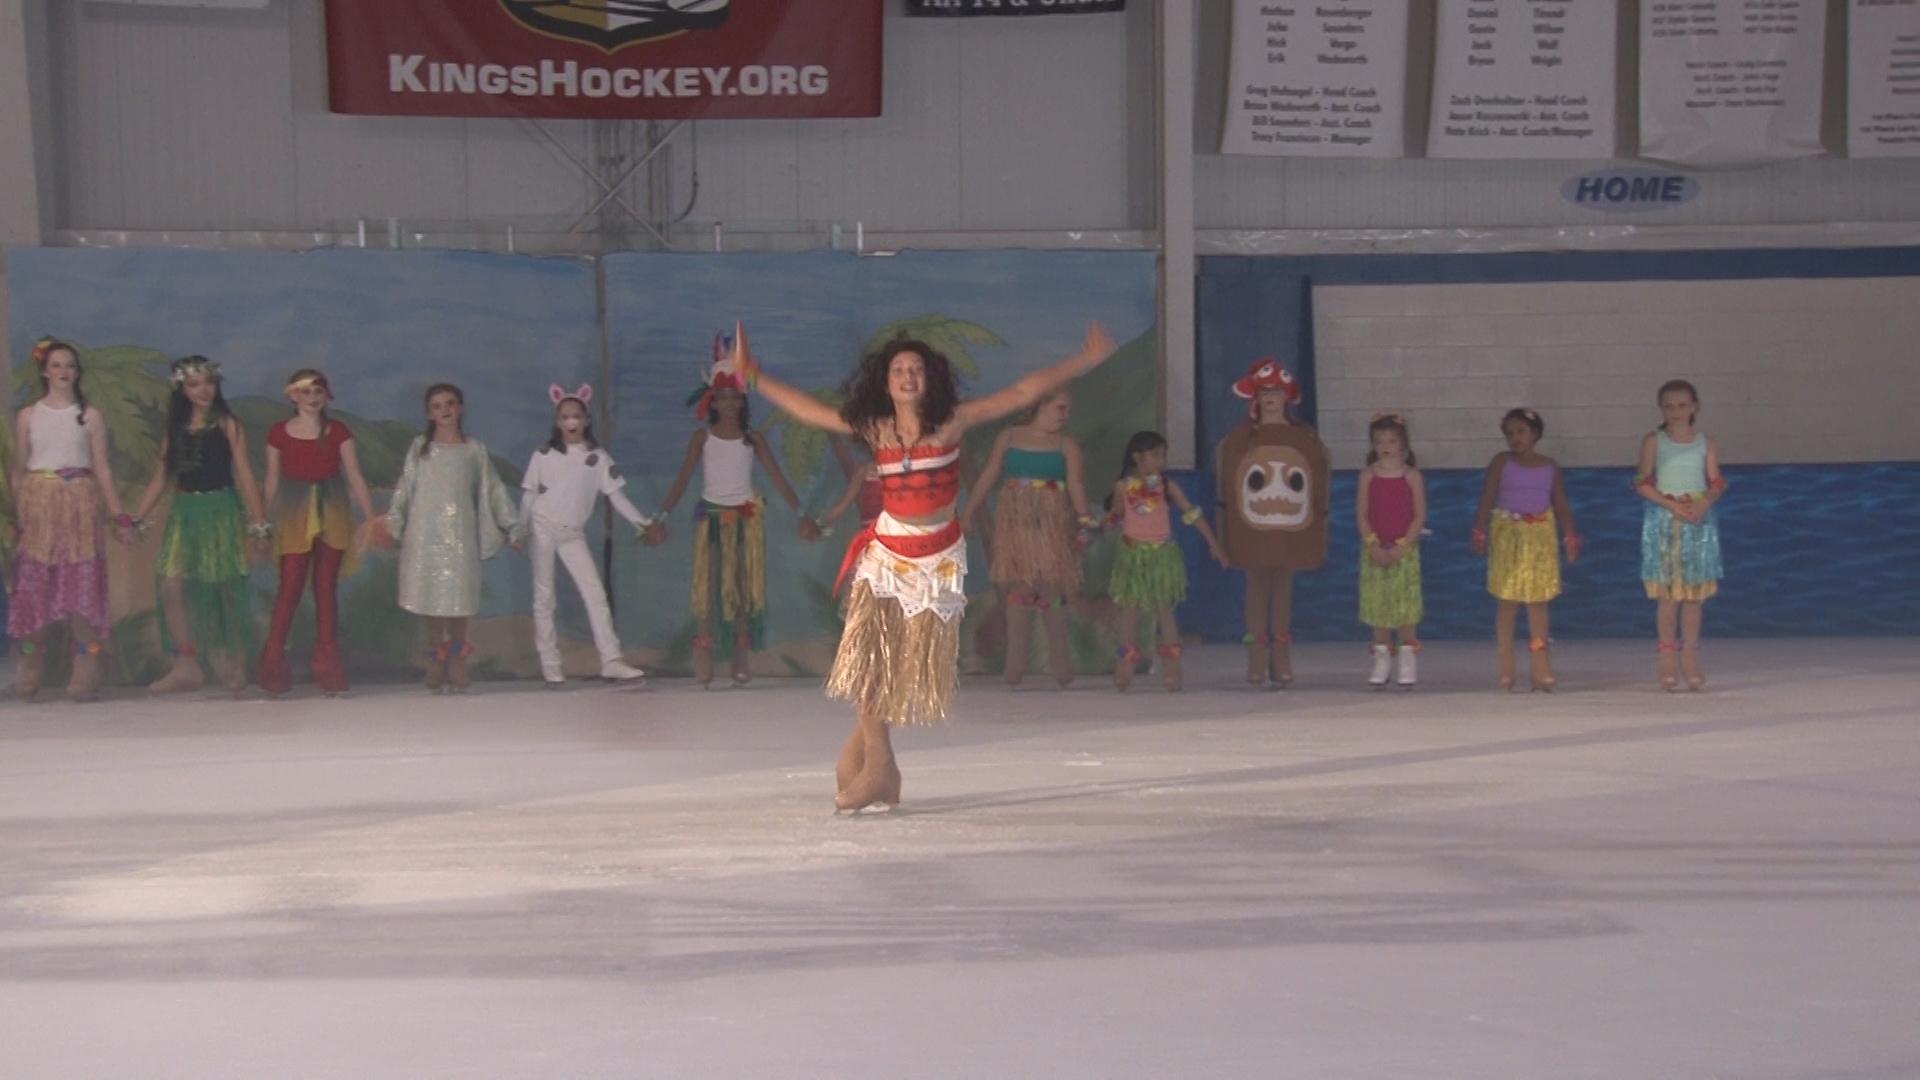 Power Play Maui Skate on Ice 071417.01_01_07_21.Still105.jpg